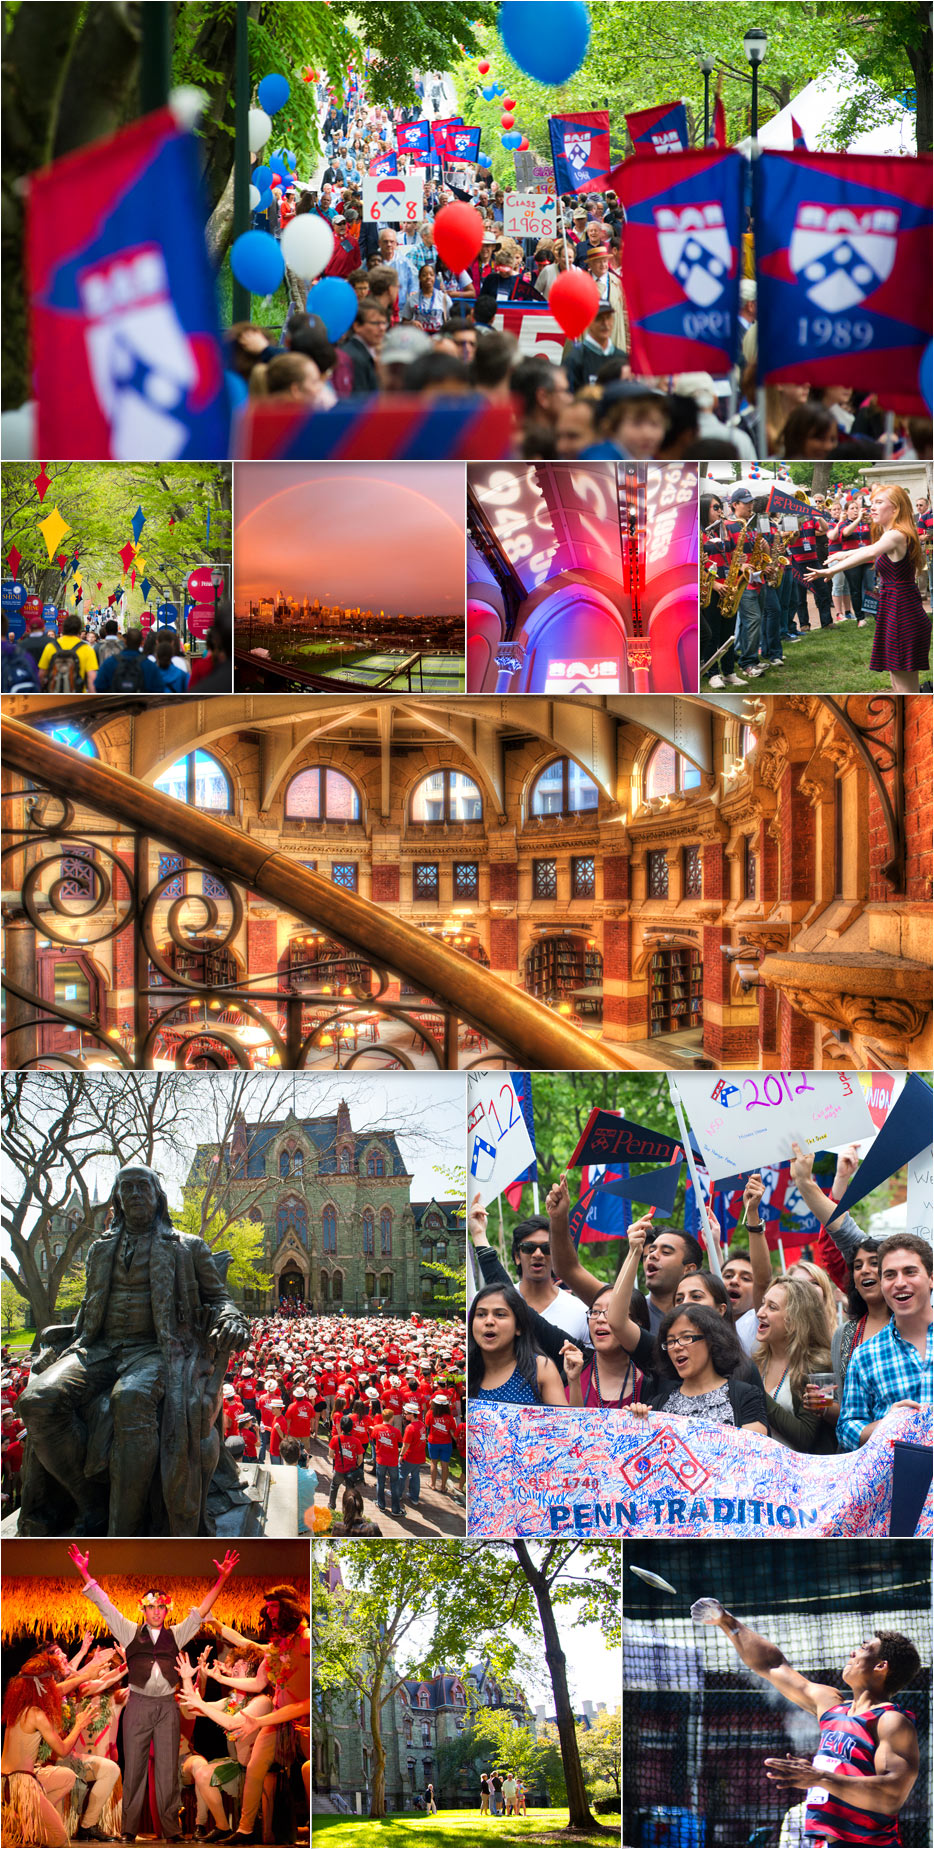 Higher education Philadelphia universities